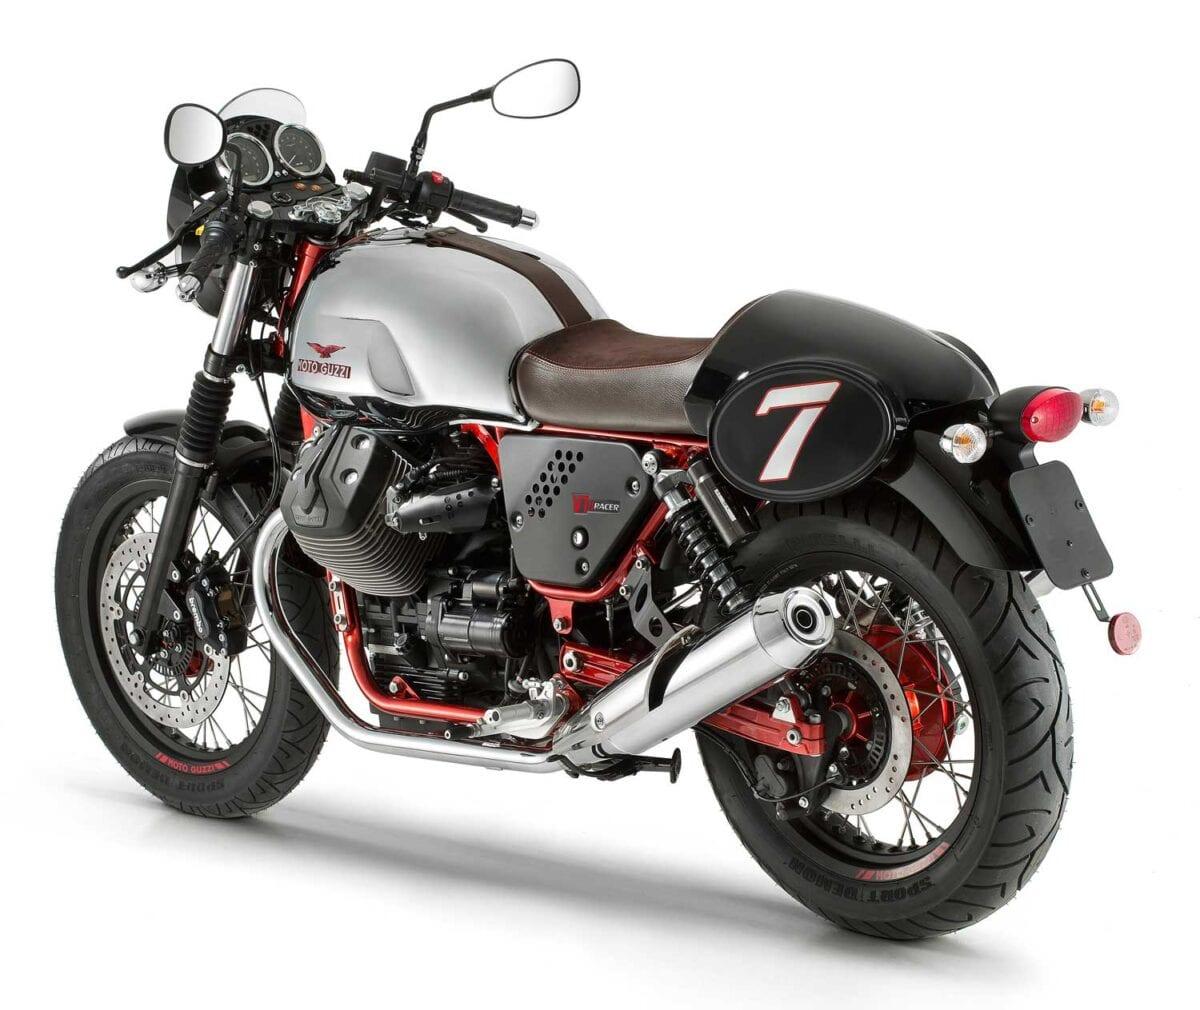 Moto-Guzzi-V7-040-03-V7-II-Racer